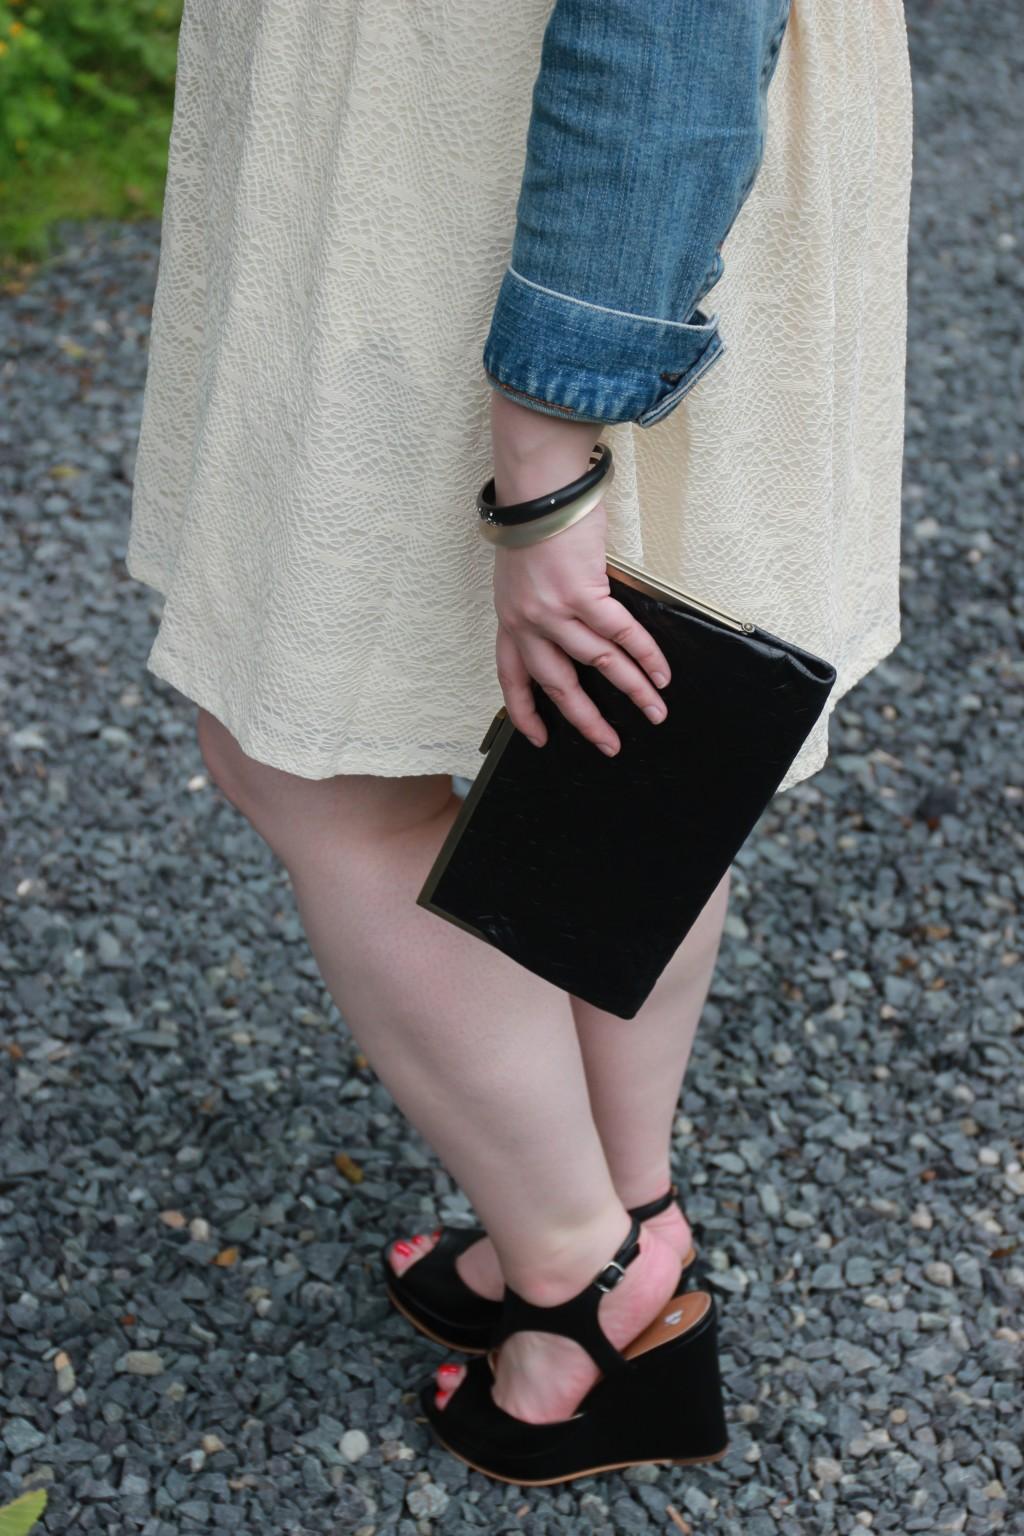 Cream and black accessories